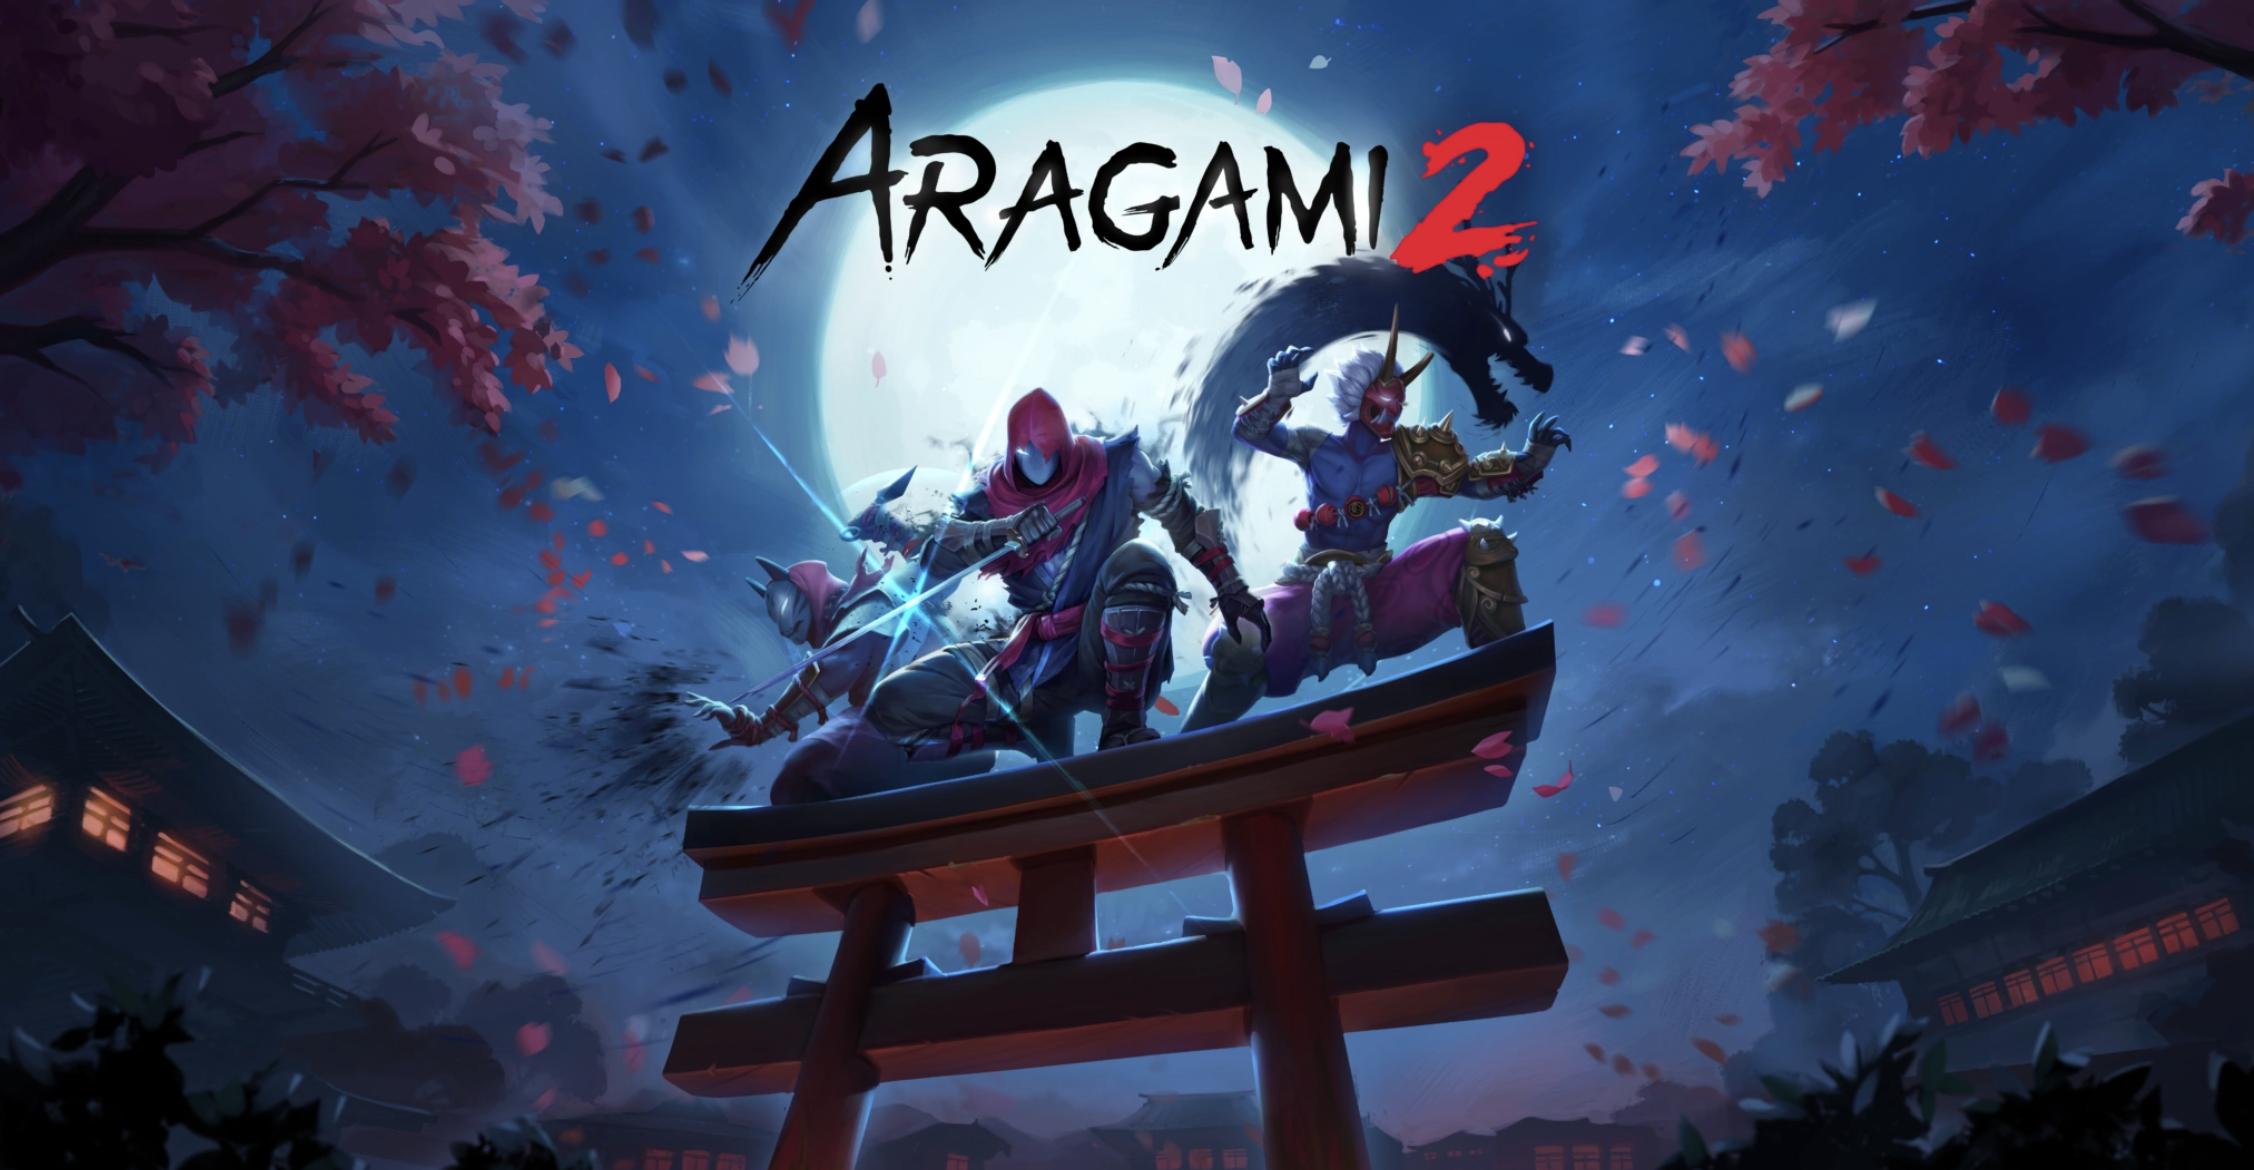 【Aragami2】PS5の発売日はいつ?予約特典と最新情報